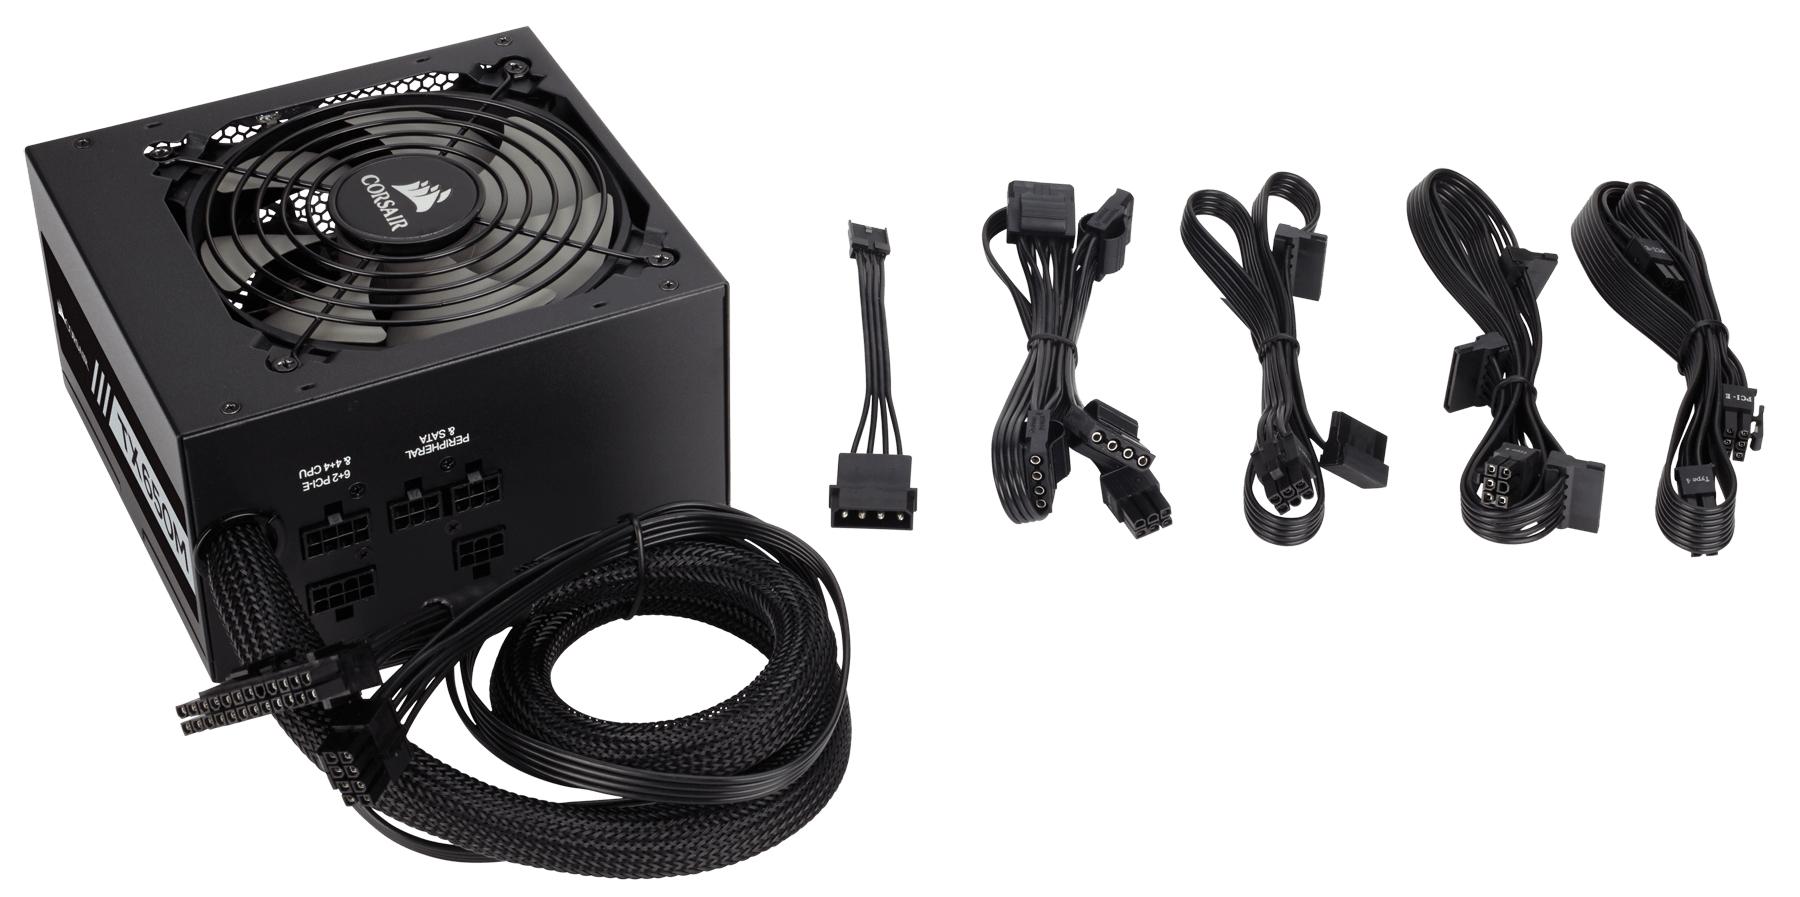 "(paydirekt) Corsair TX650M PC-Netzteil (Teil-Modulares Kabelmanagement, 80 Plus Gold, 650 Watt, EU) Amazon's Choice für ""netzteil"""